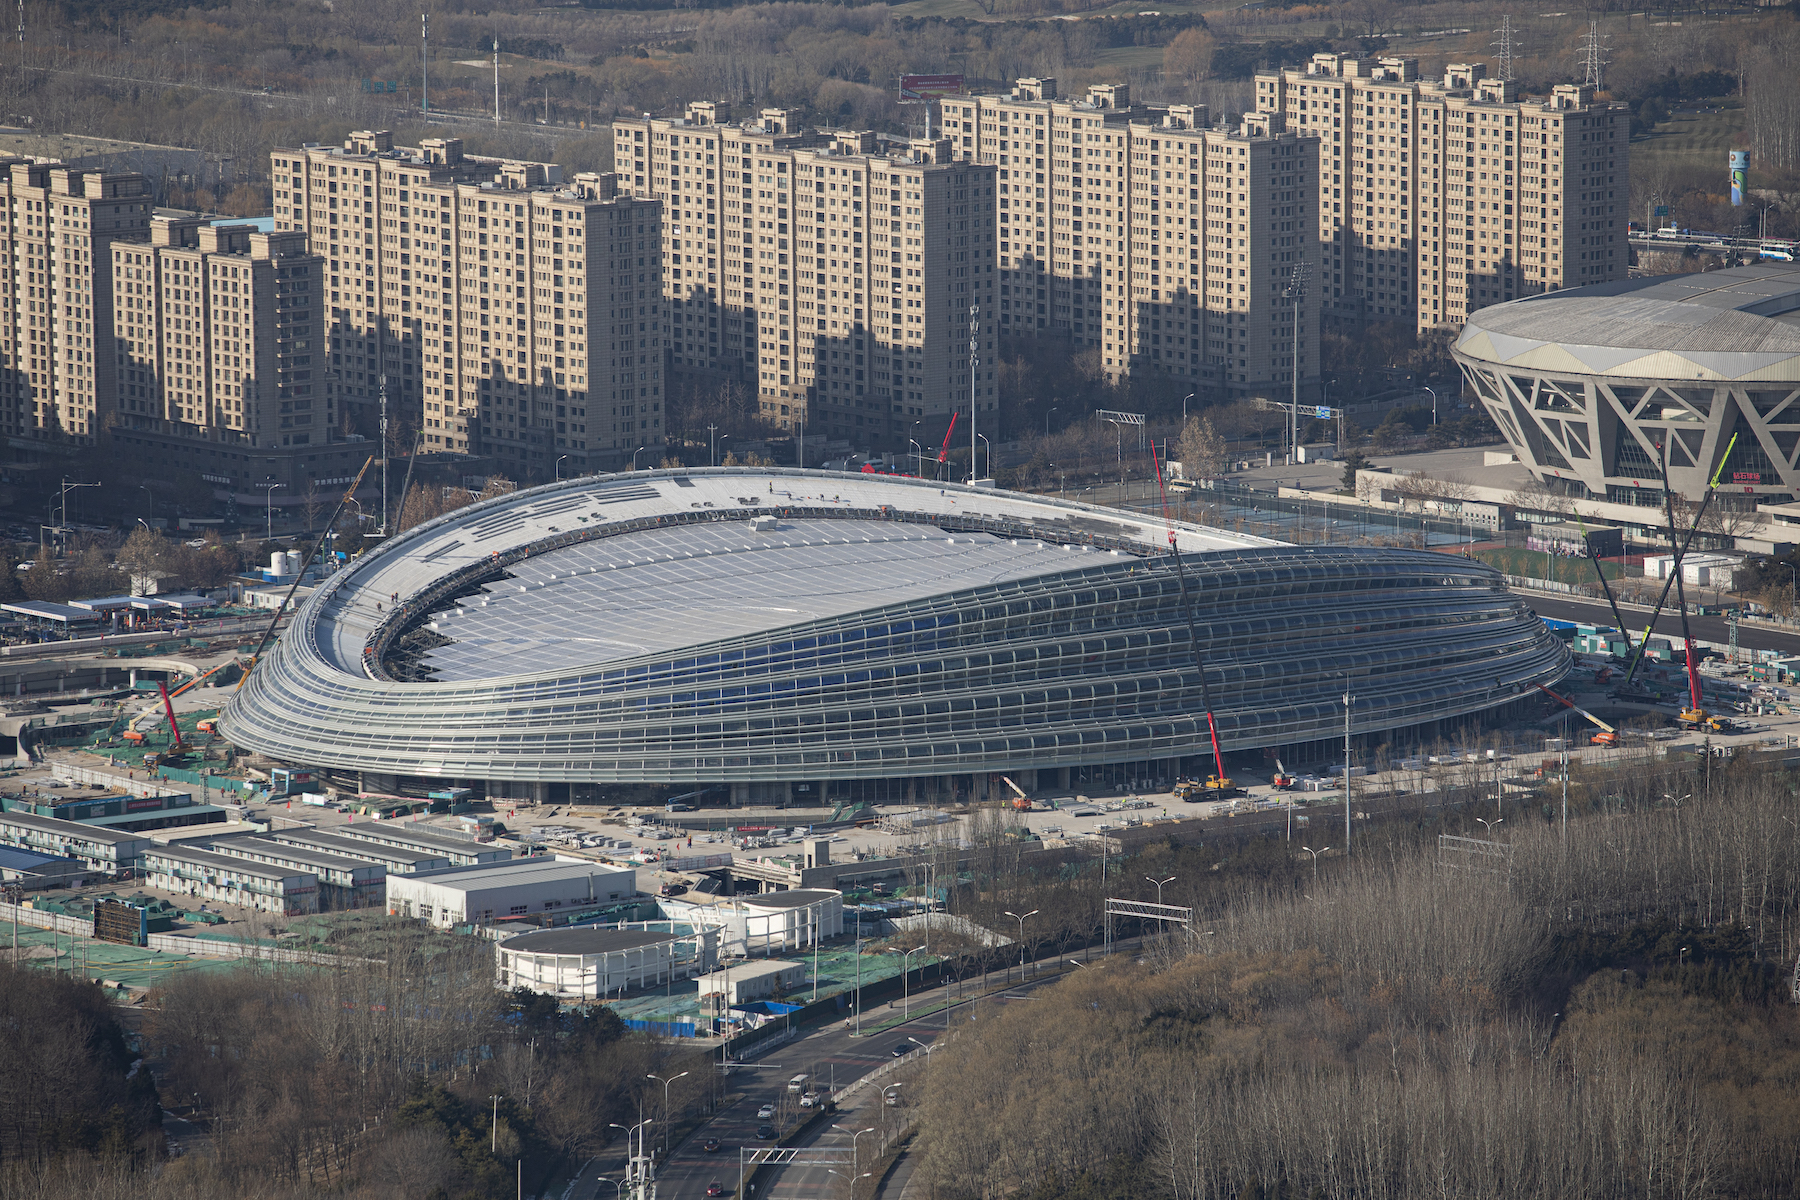 National Speed Skating Oval Beijing 2